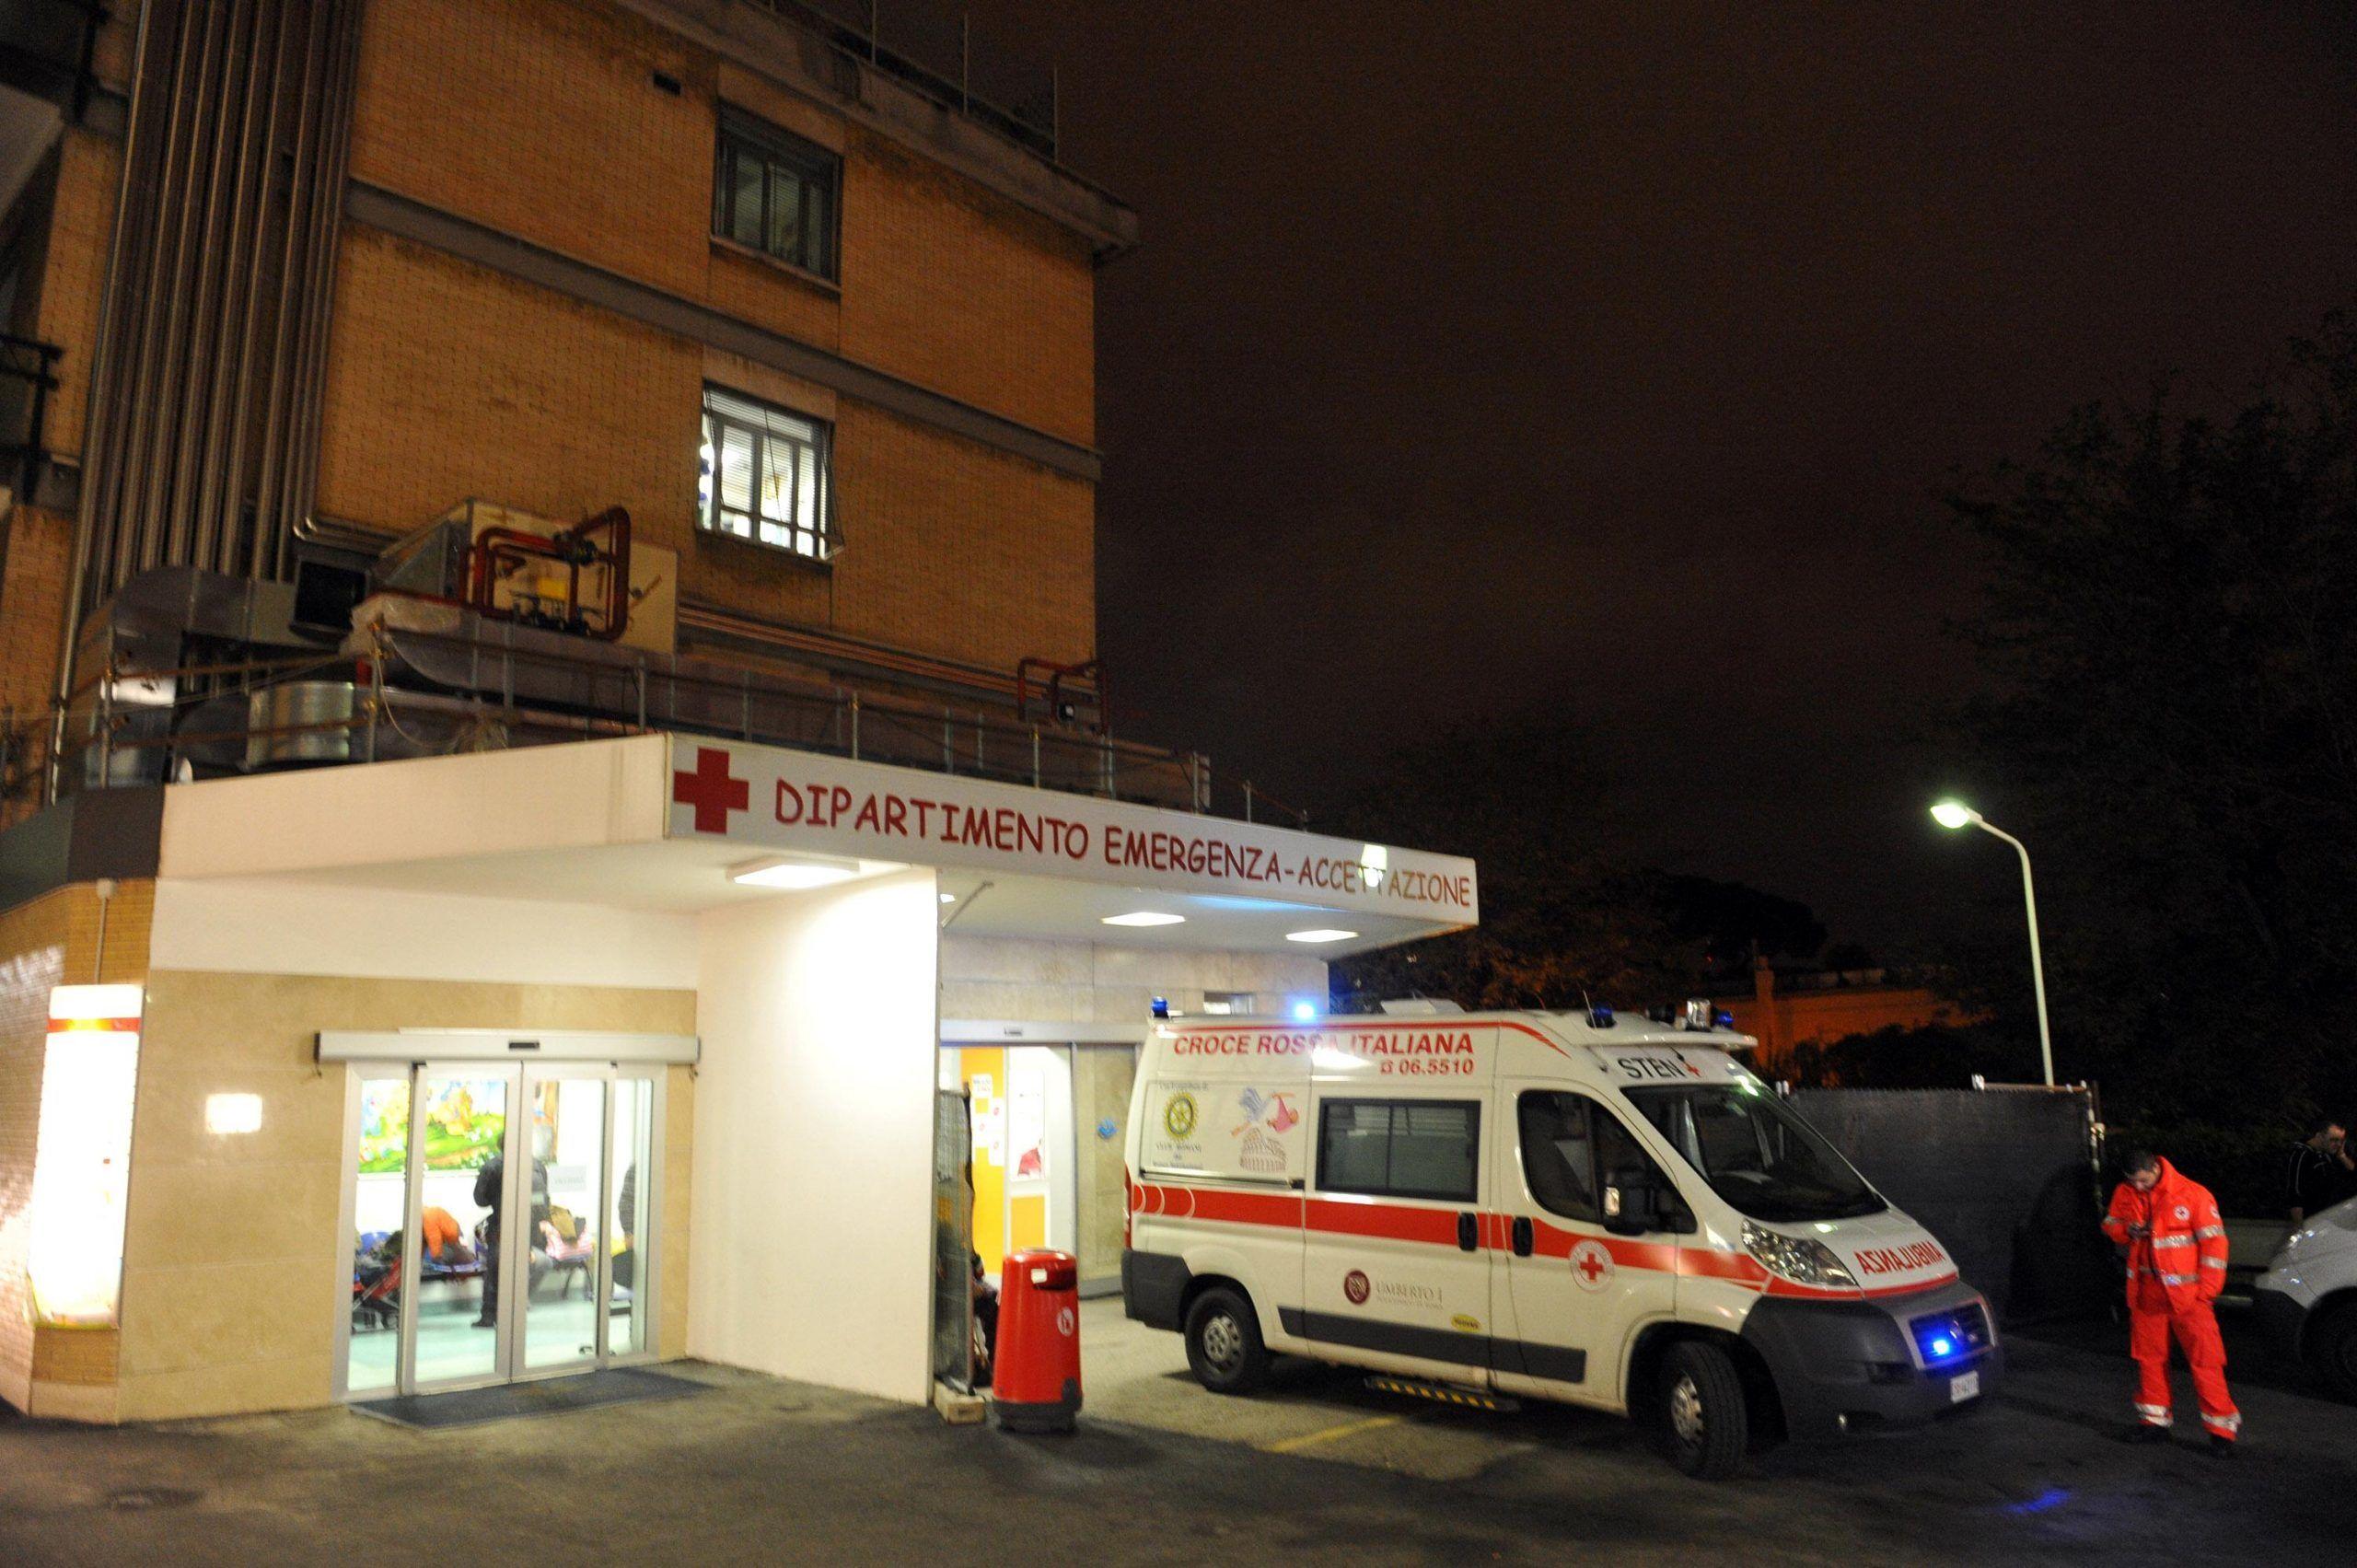 Morbillo a Roma: bambina muore a 16 mesi all'ospedale Bambino Gesù